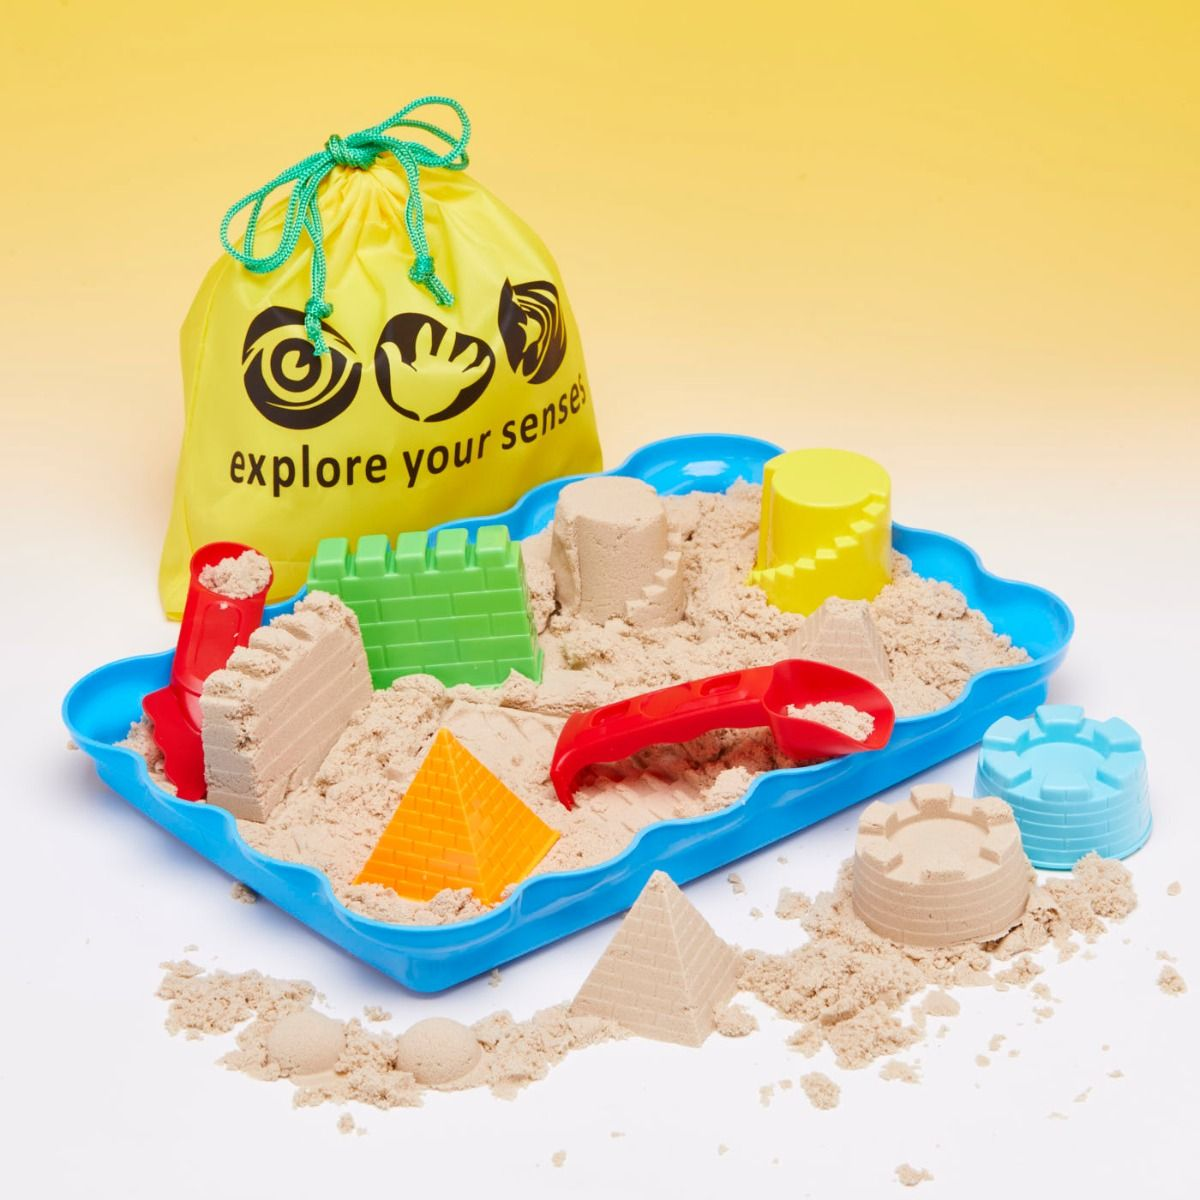 Magic Motion Sand Exploration Set - BEACHTIME (kinetic sand)